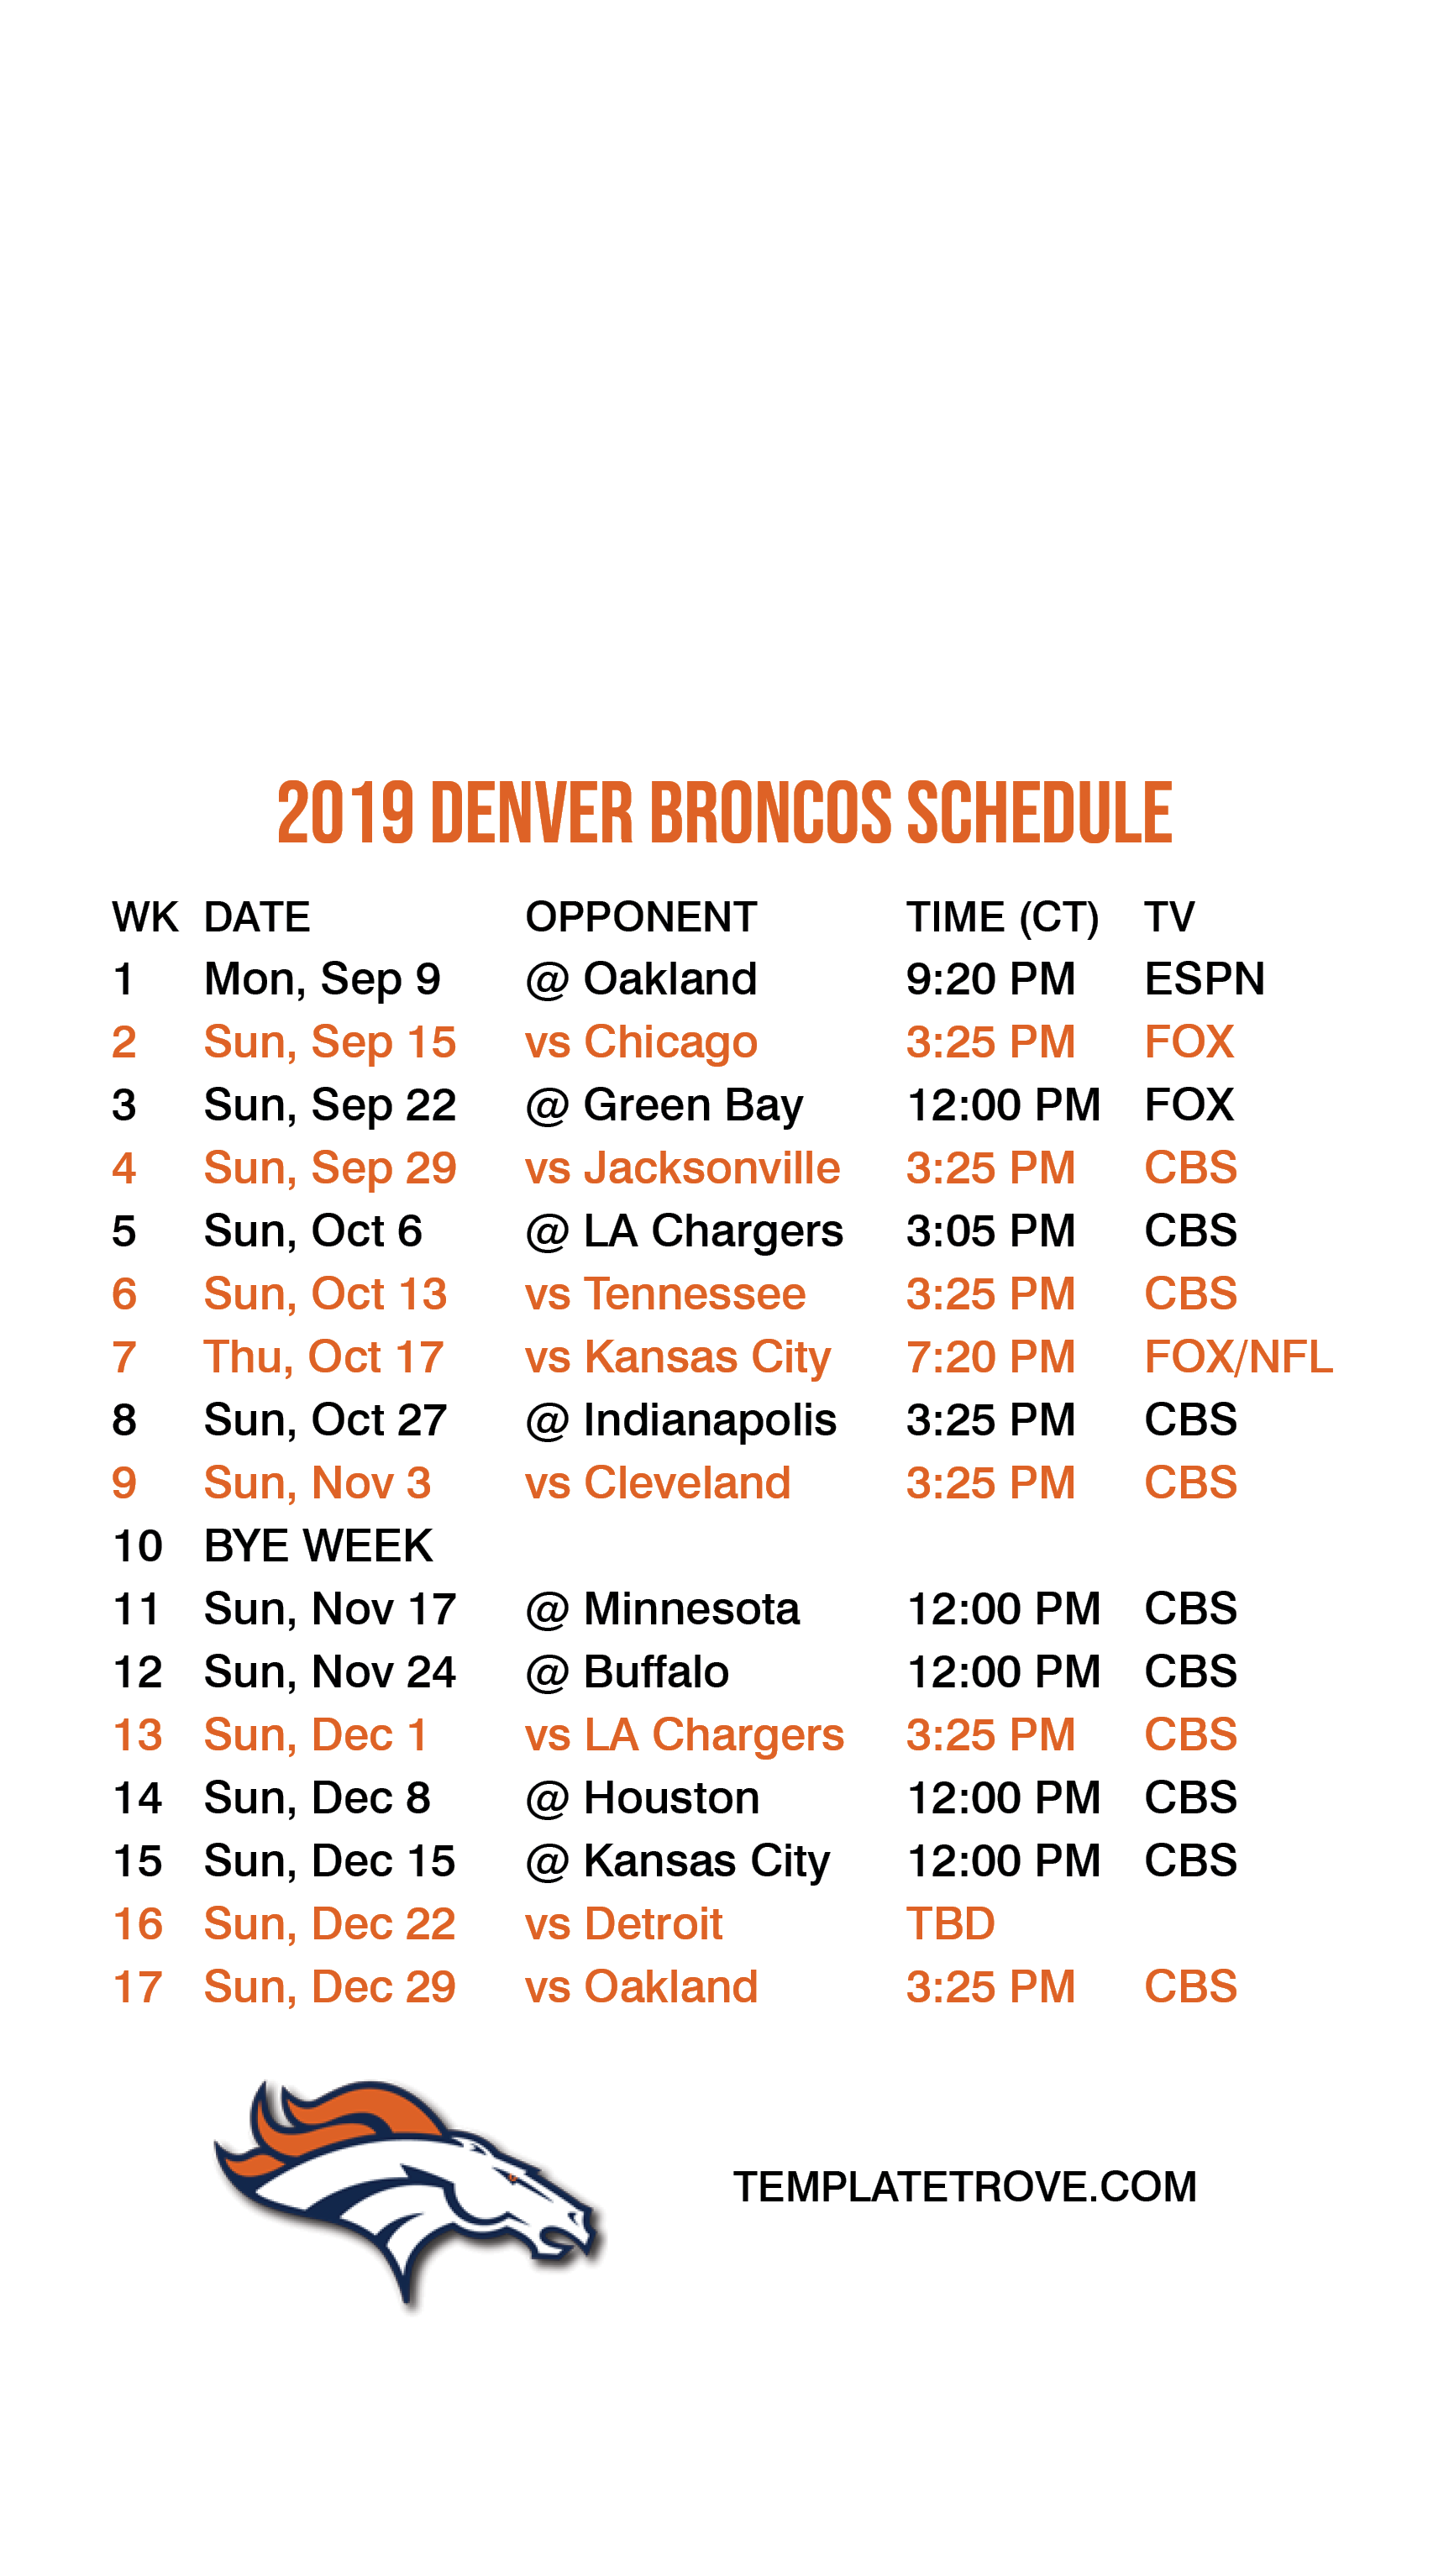 2019 2020 Denver Broncos Lock Screen Schedule For Iphone 6